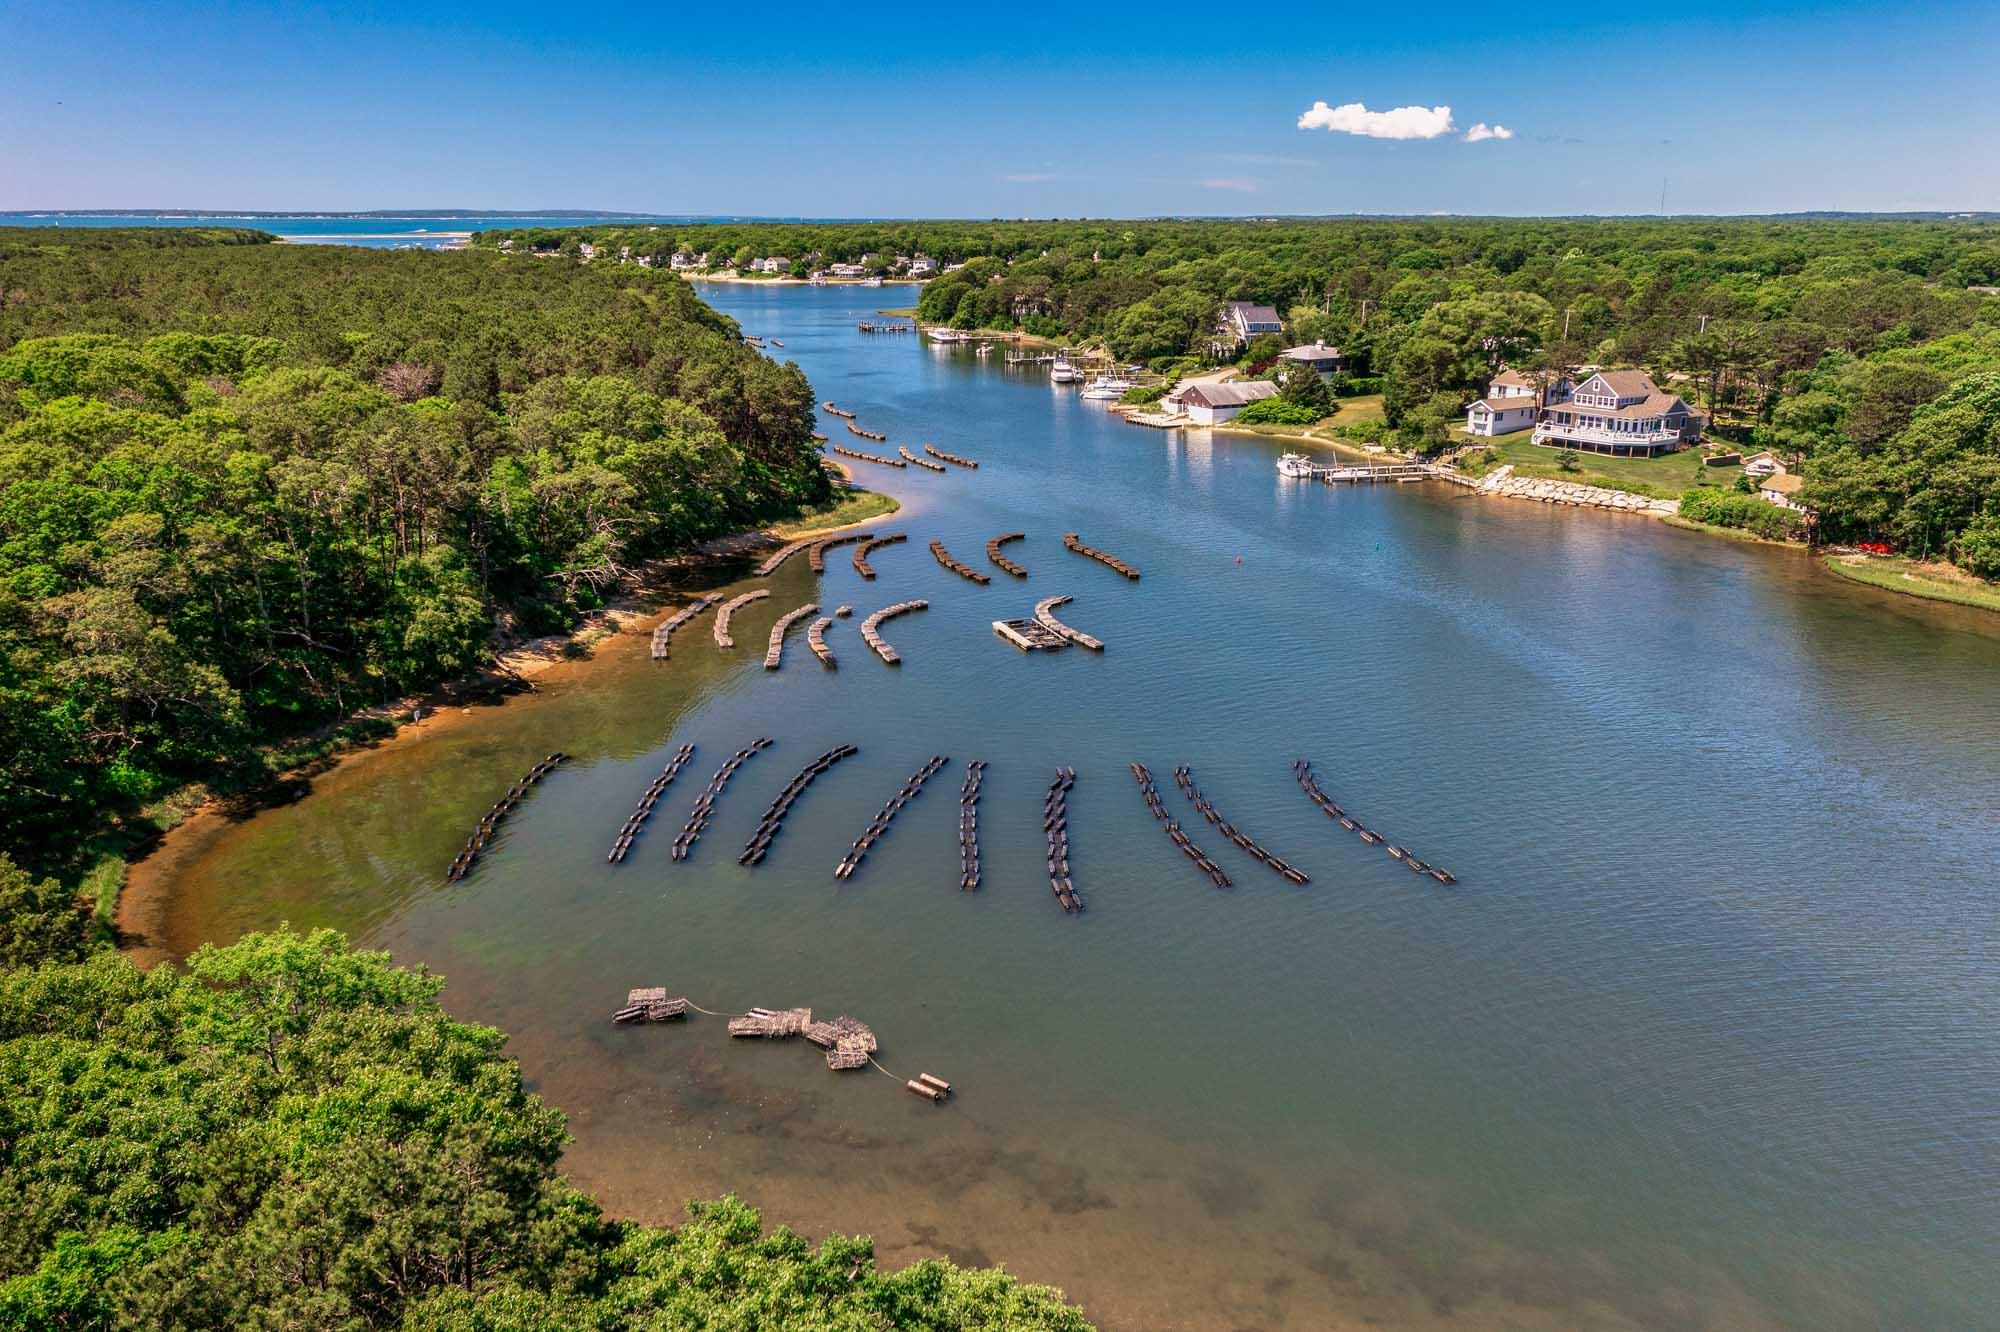 Cape Cod Oyster Company Aerial Falmouth